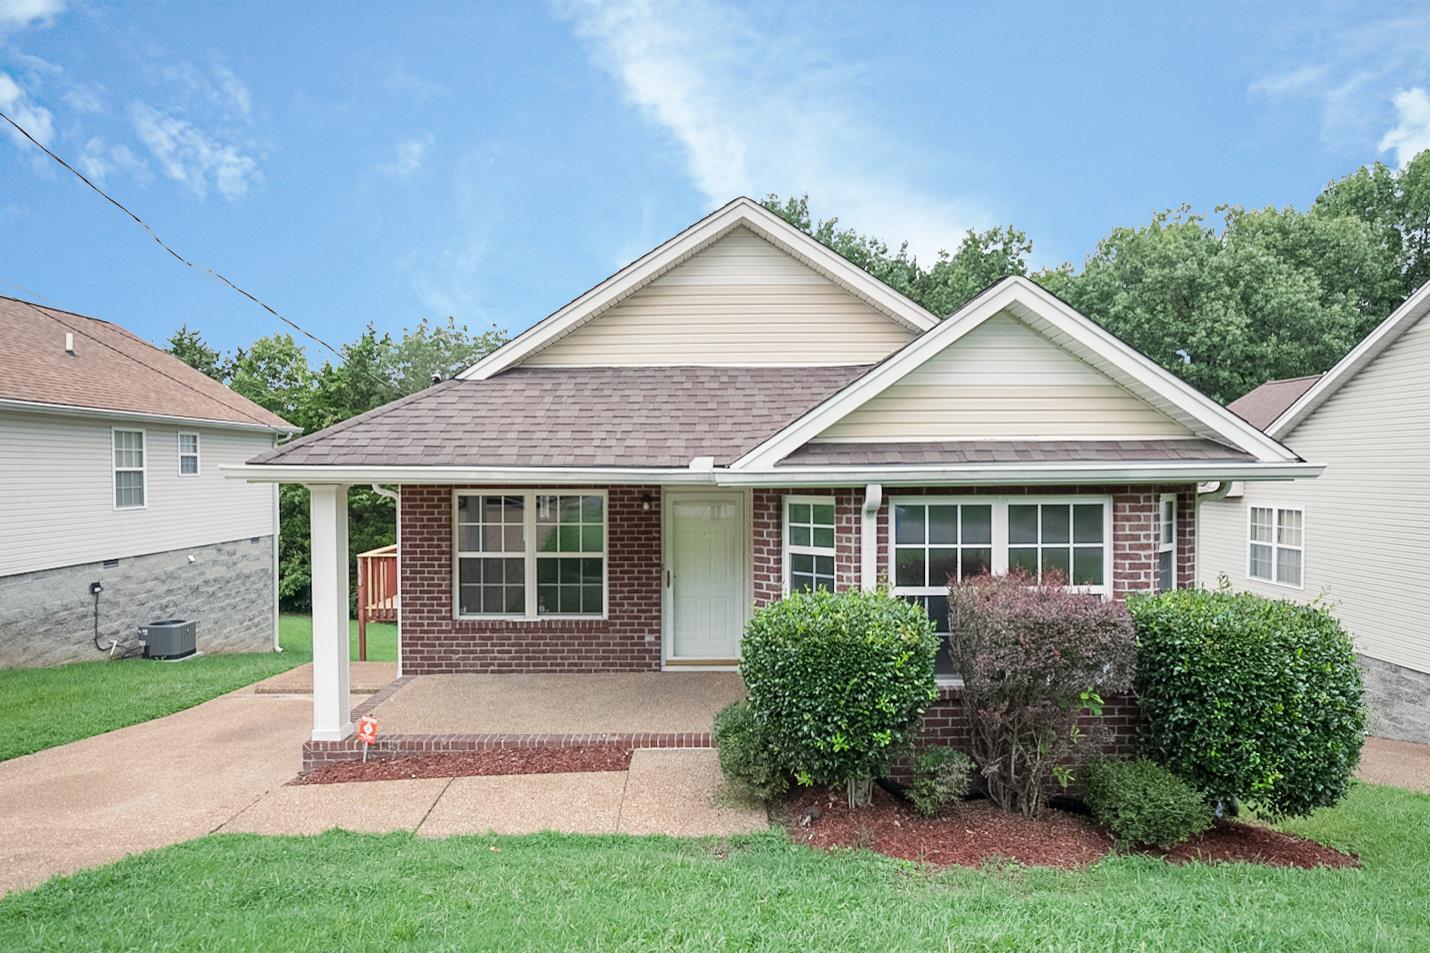 2857 Old Matthews Rd, Nashville, TN 37207 - Nashville, TN real estate listing